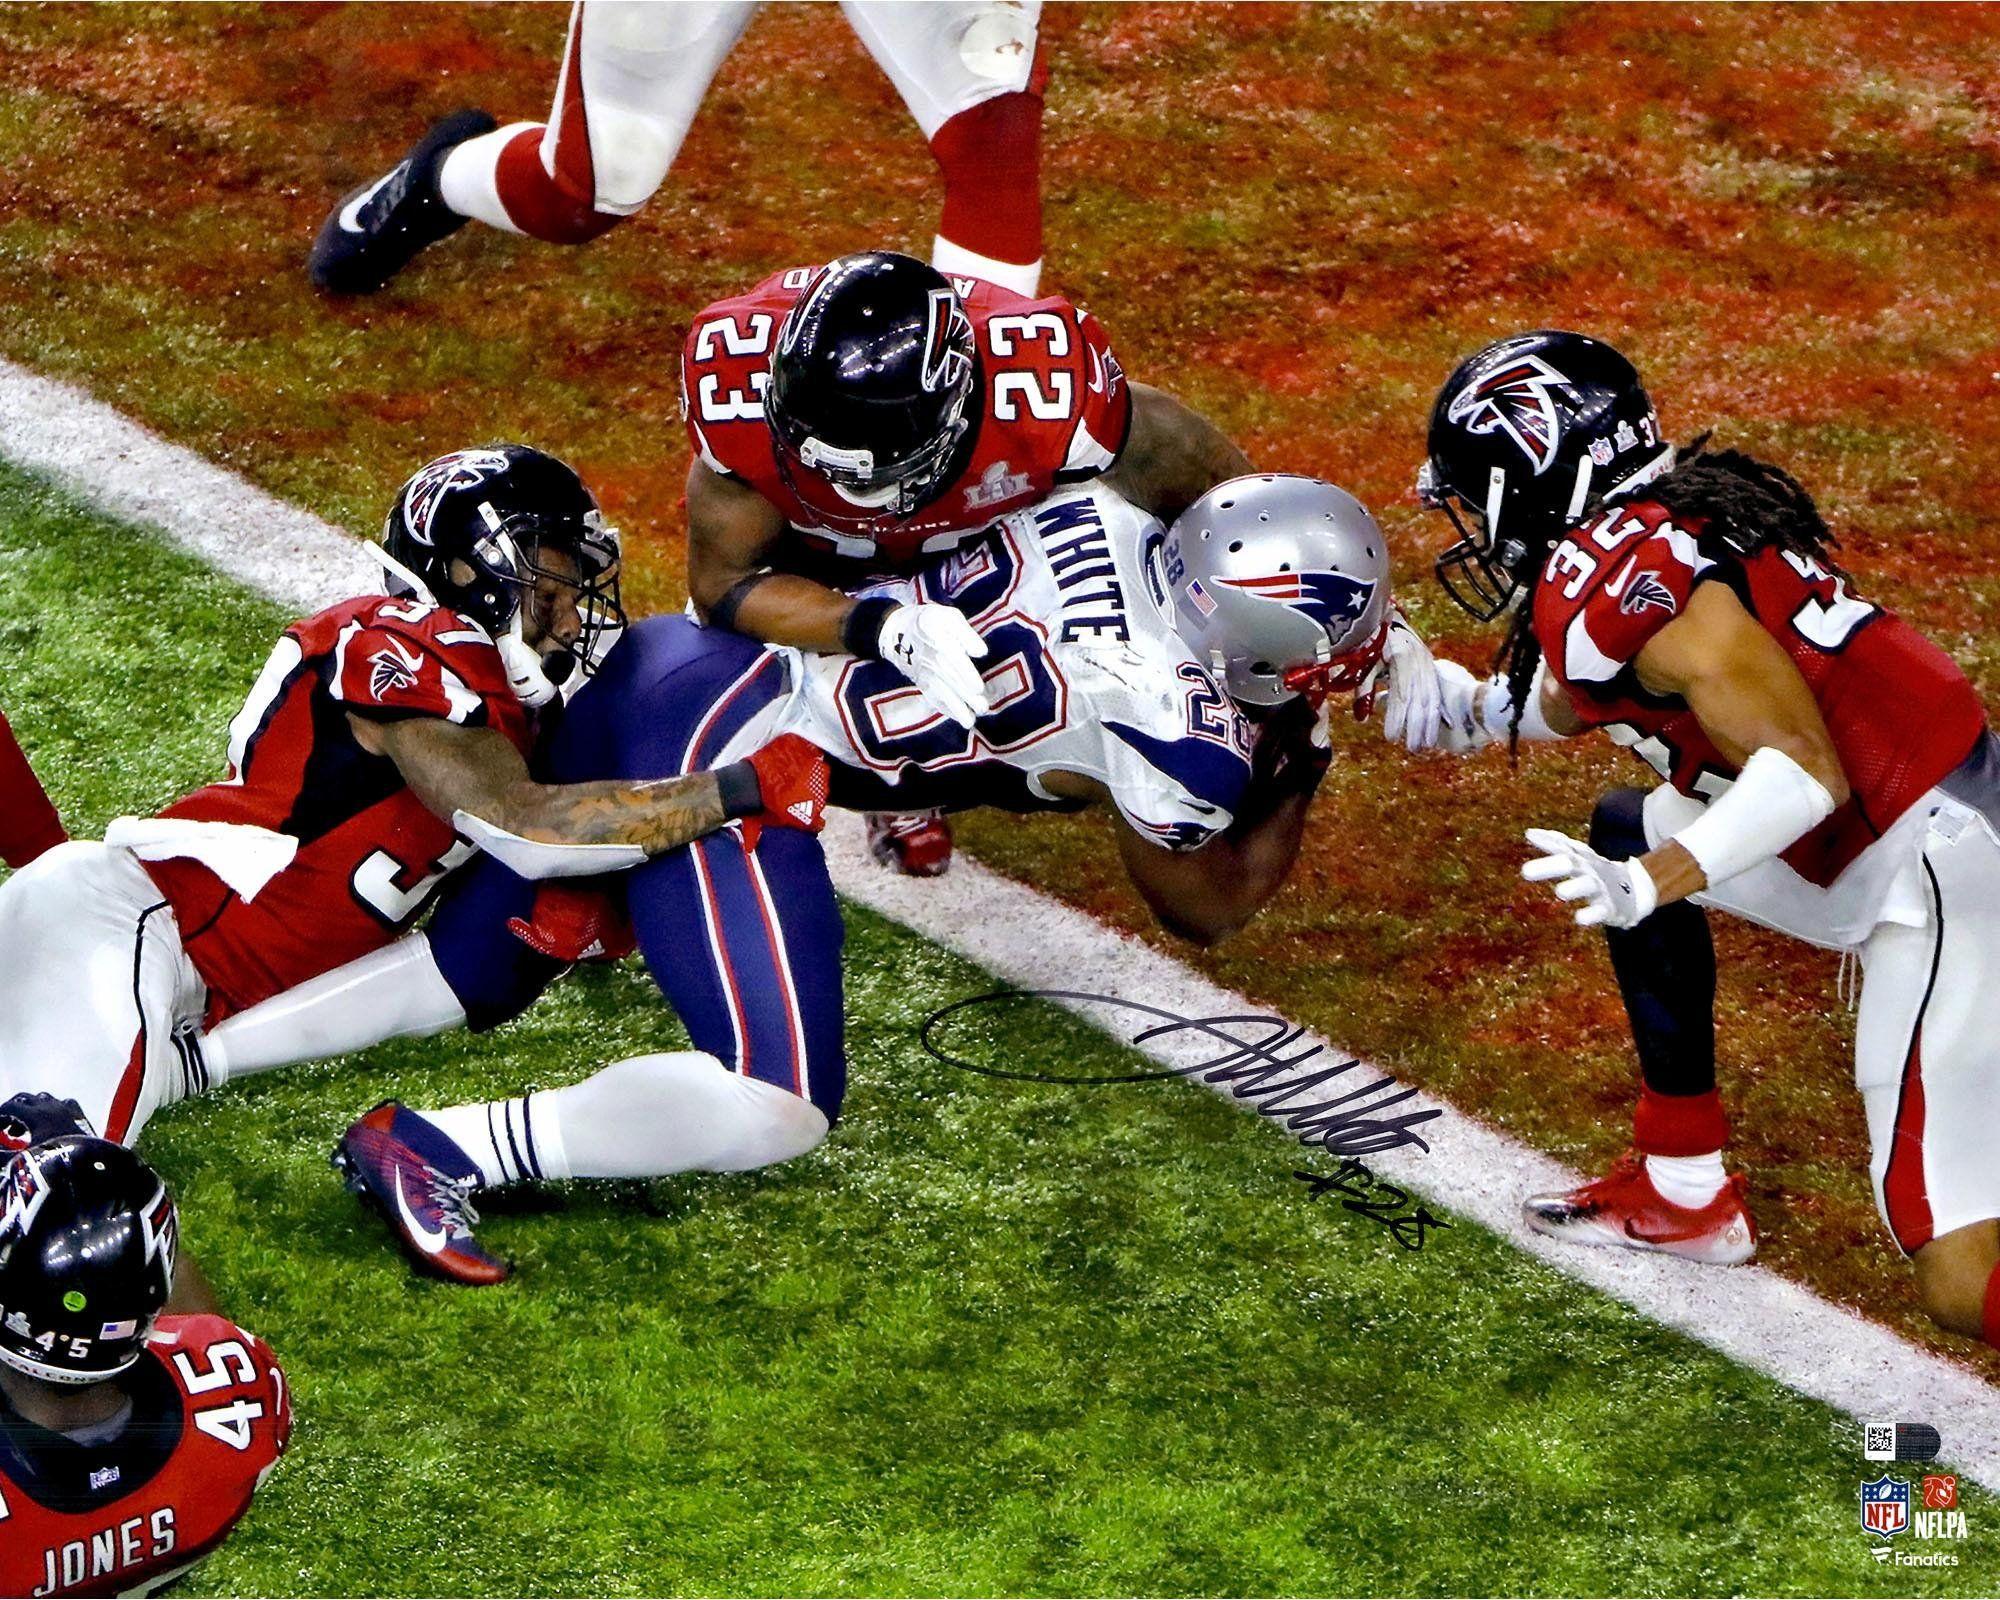 James White New England Patriots Autographed 16 X 20 Super Bowl Li Champions Gamewinning Touchdown Photograph F James White Super Bowl Li New England Patriots